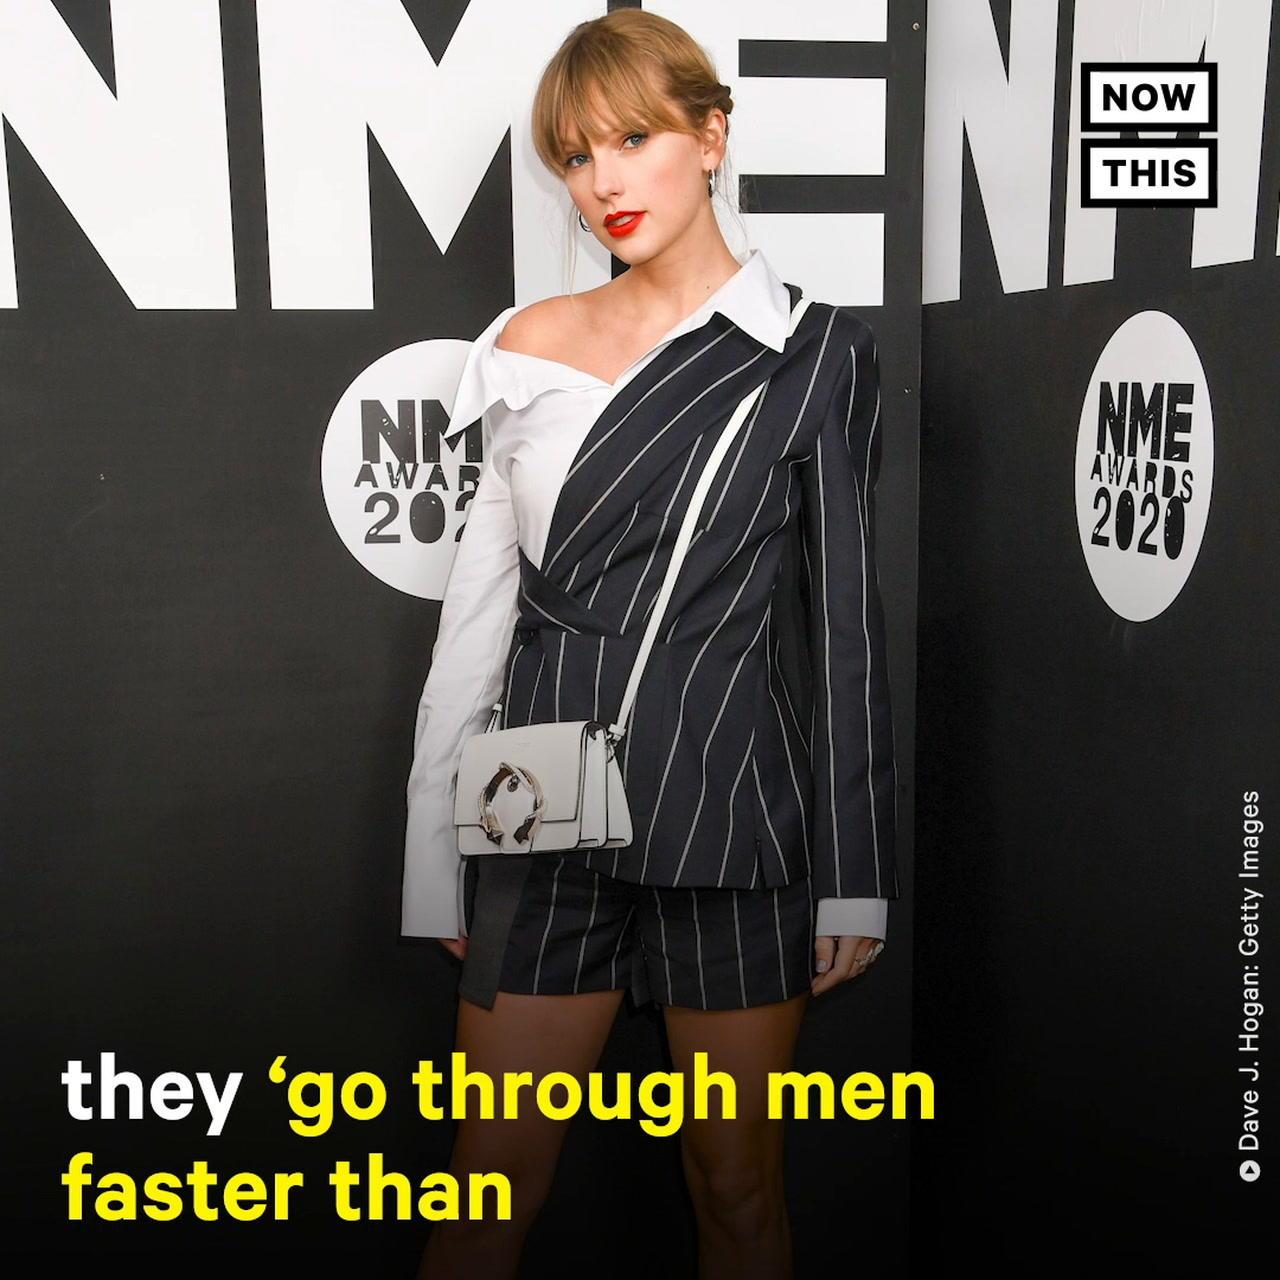 Taylor Swift Slams Netflix Show 'Ginny & Georgia' for 'Deeply Sexist' Joke